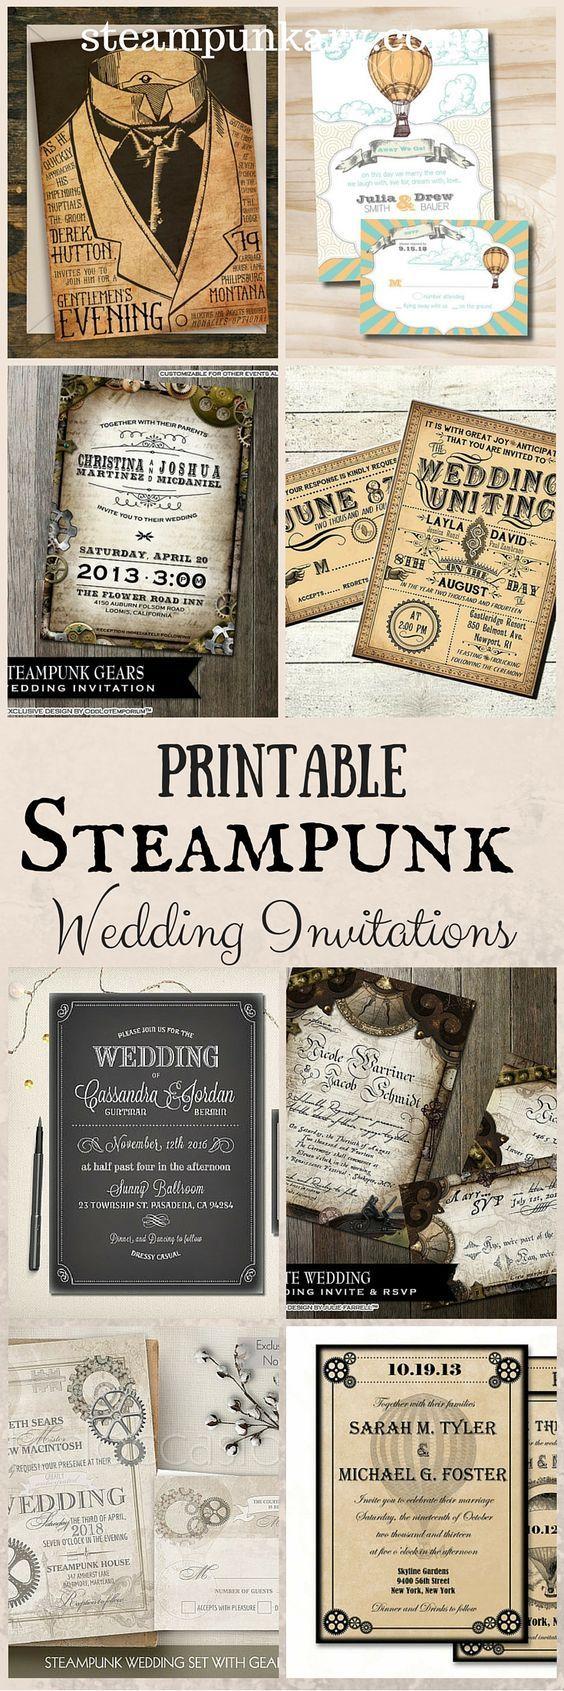 watch wedding invitation movie online eng sub%0A Printable Steampunk Wedding Invitations